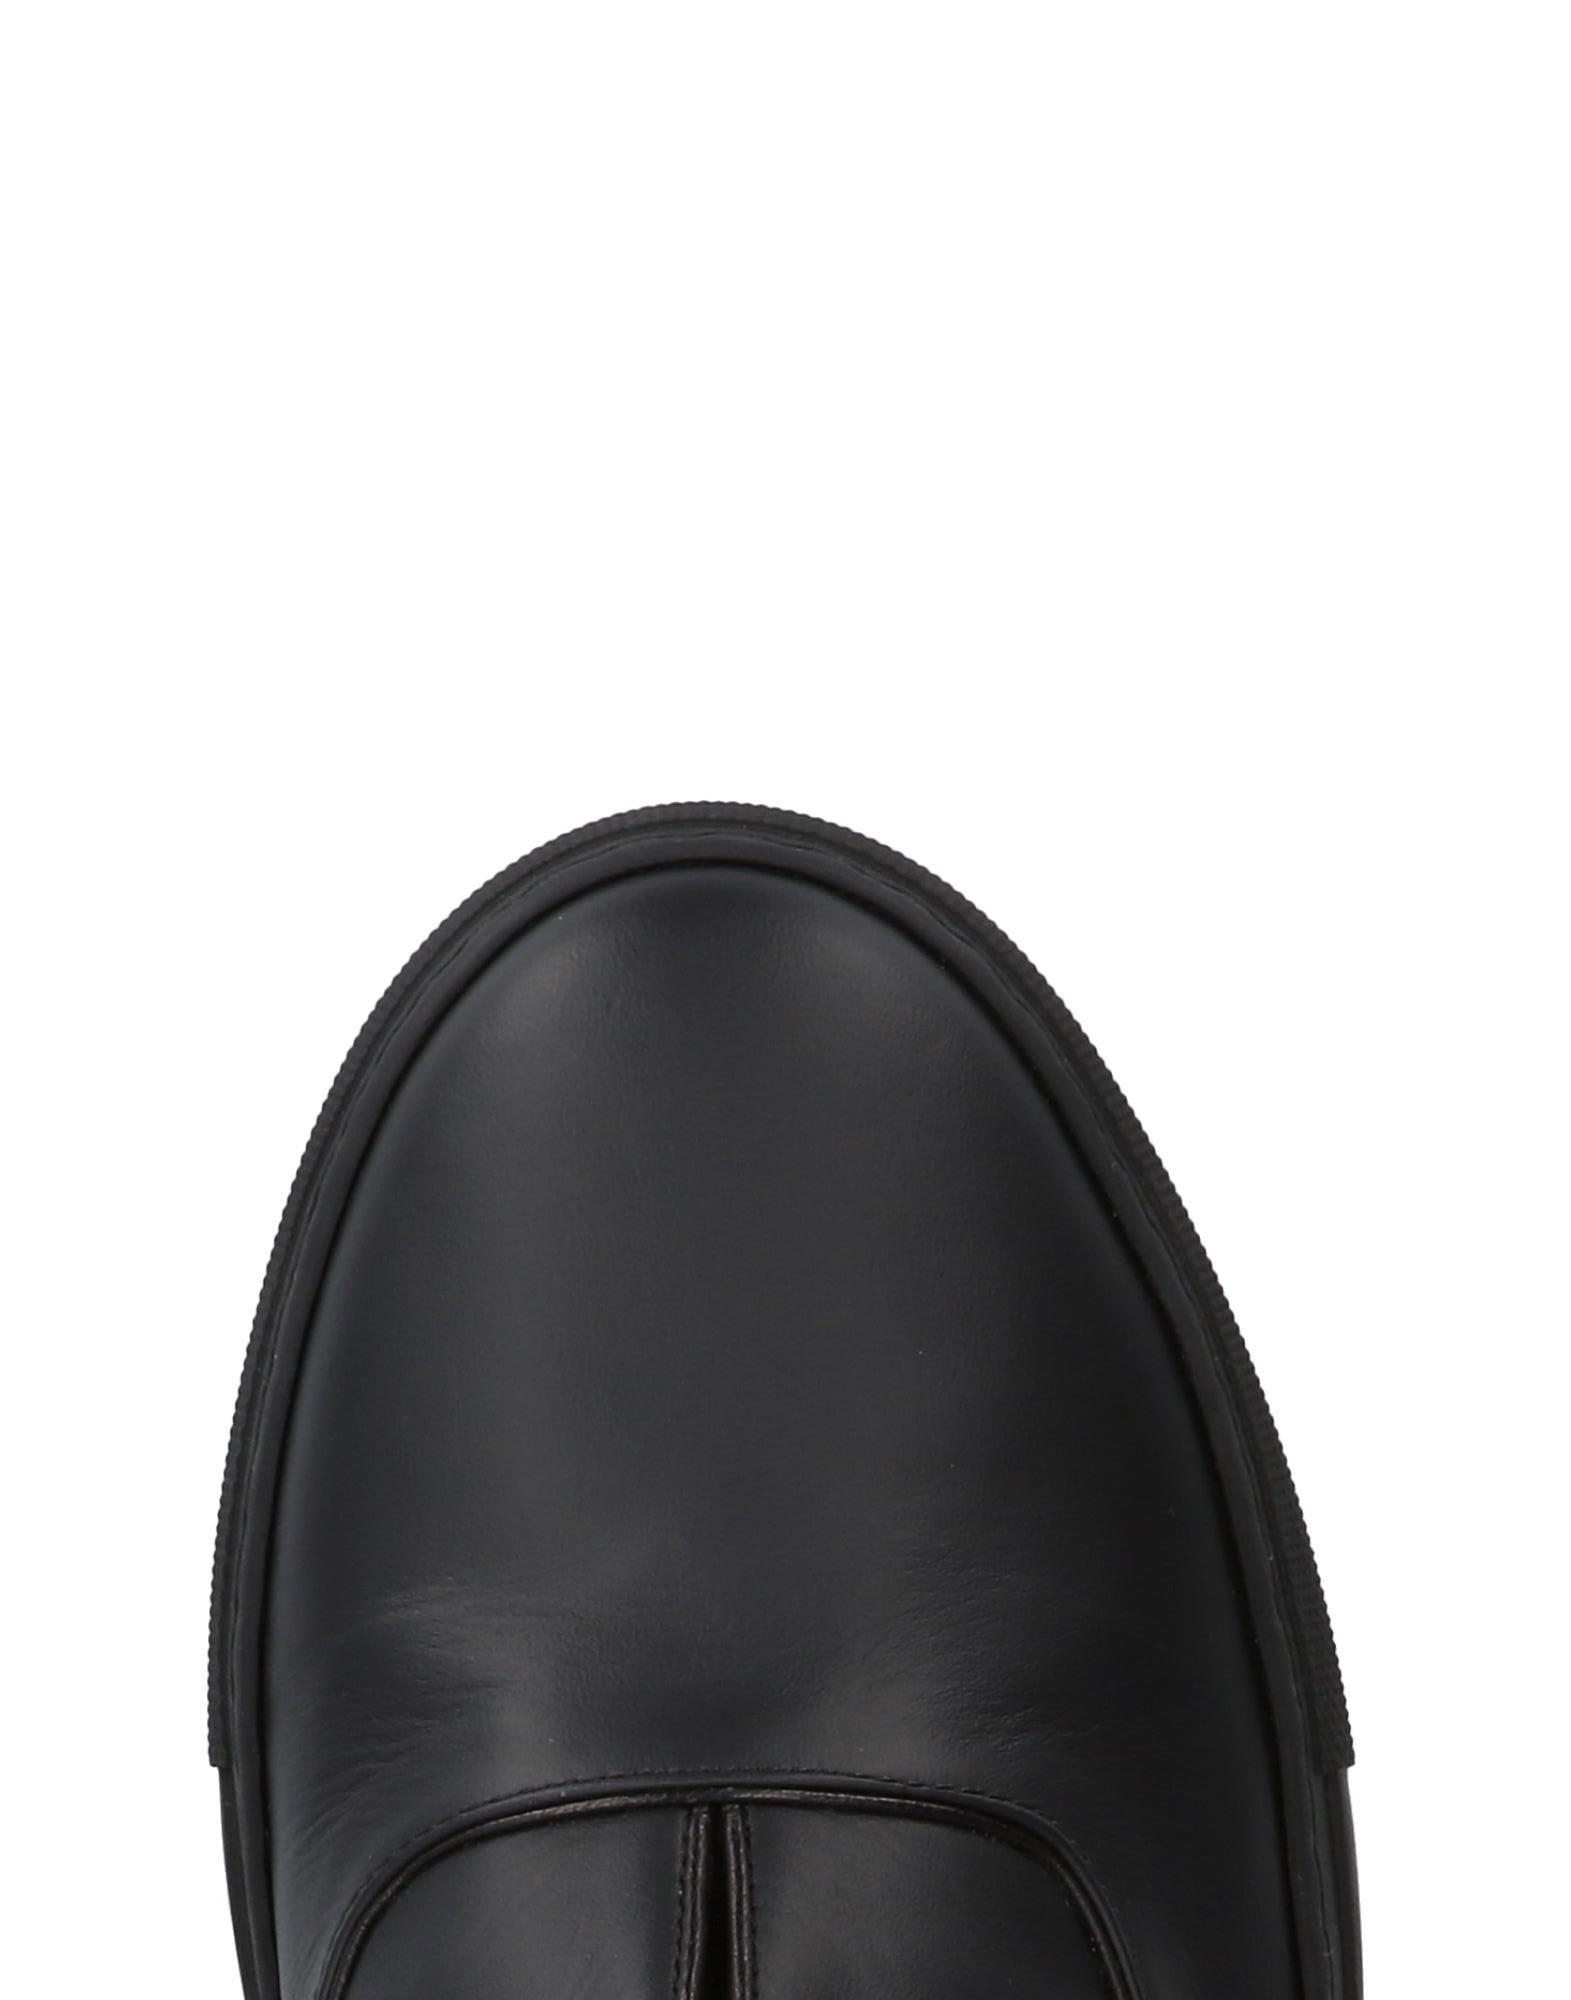 Dibrera Herren By Paolo Zanoli Sneakers Herren Dibrera  11445828BT Gute Qualität beliebte Schuhe 73a62b